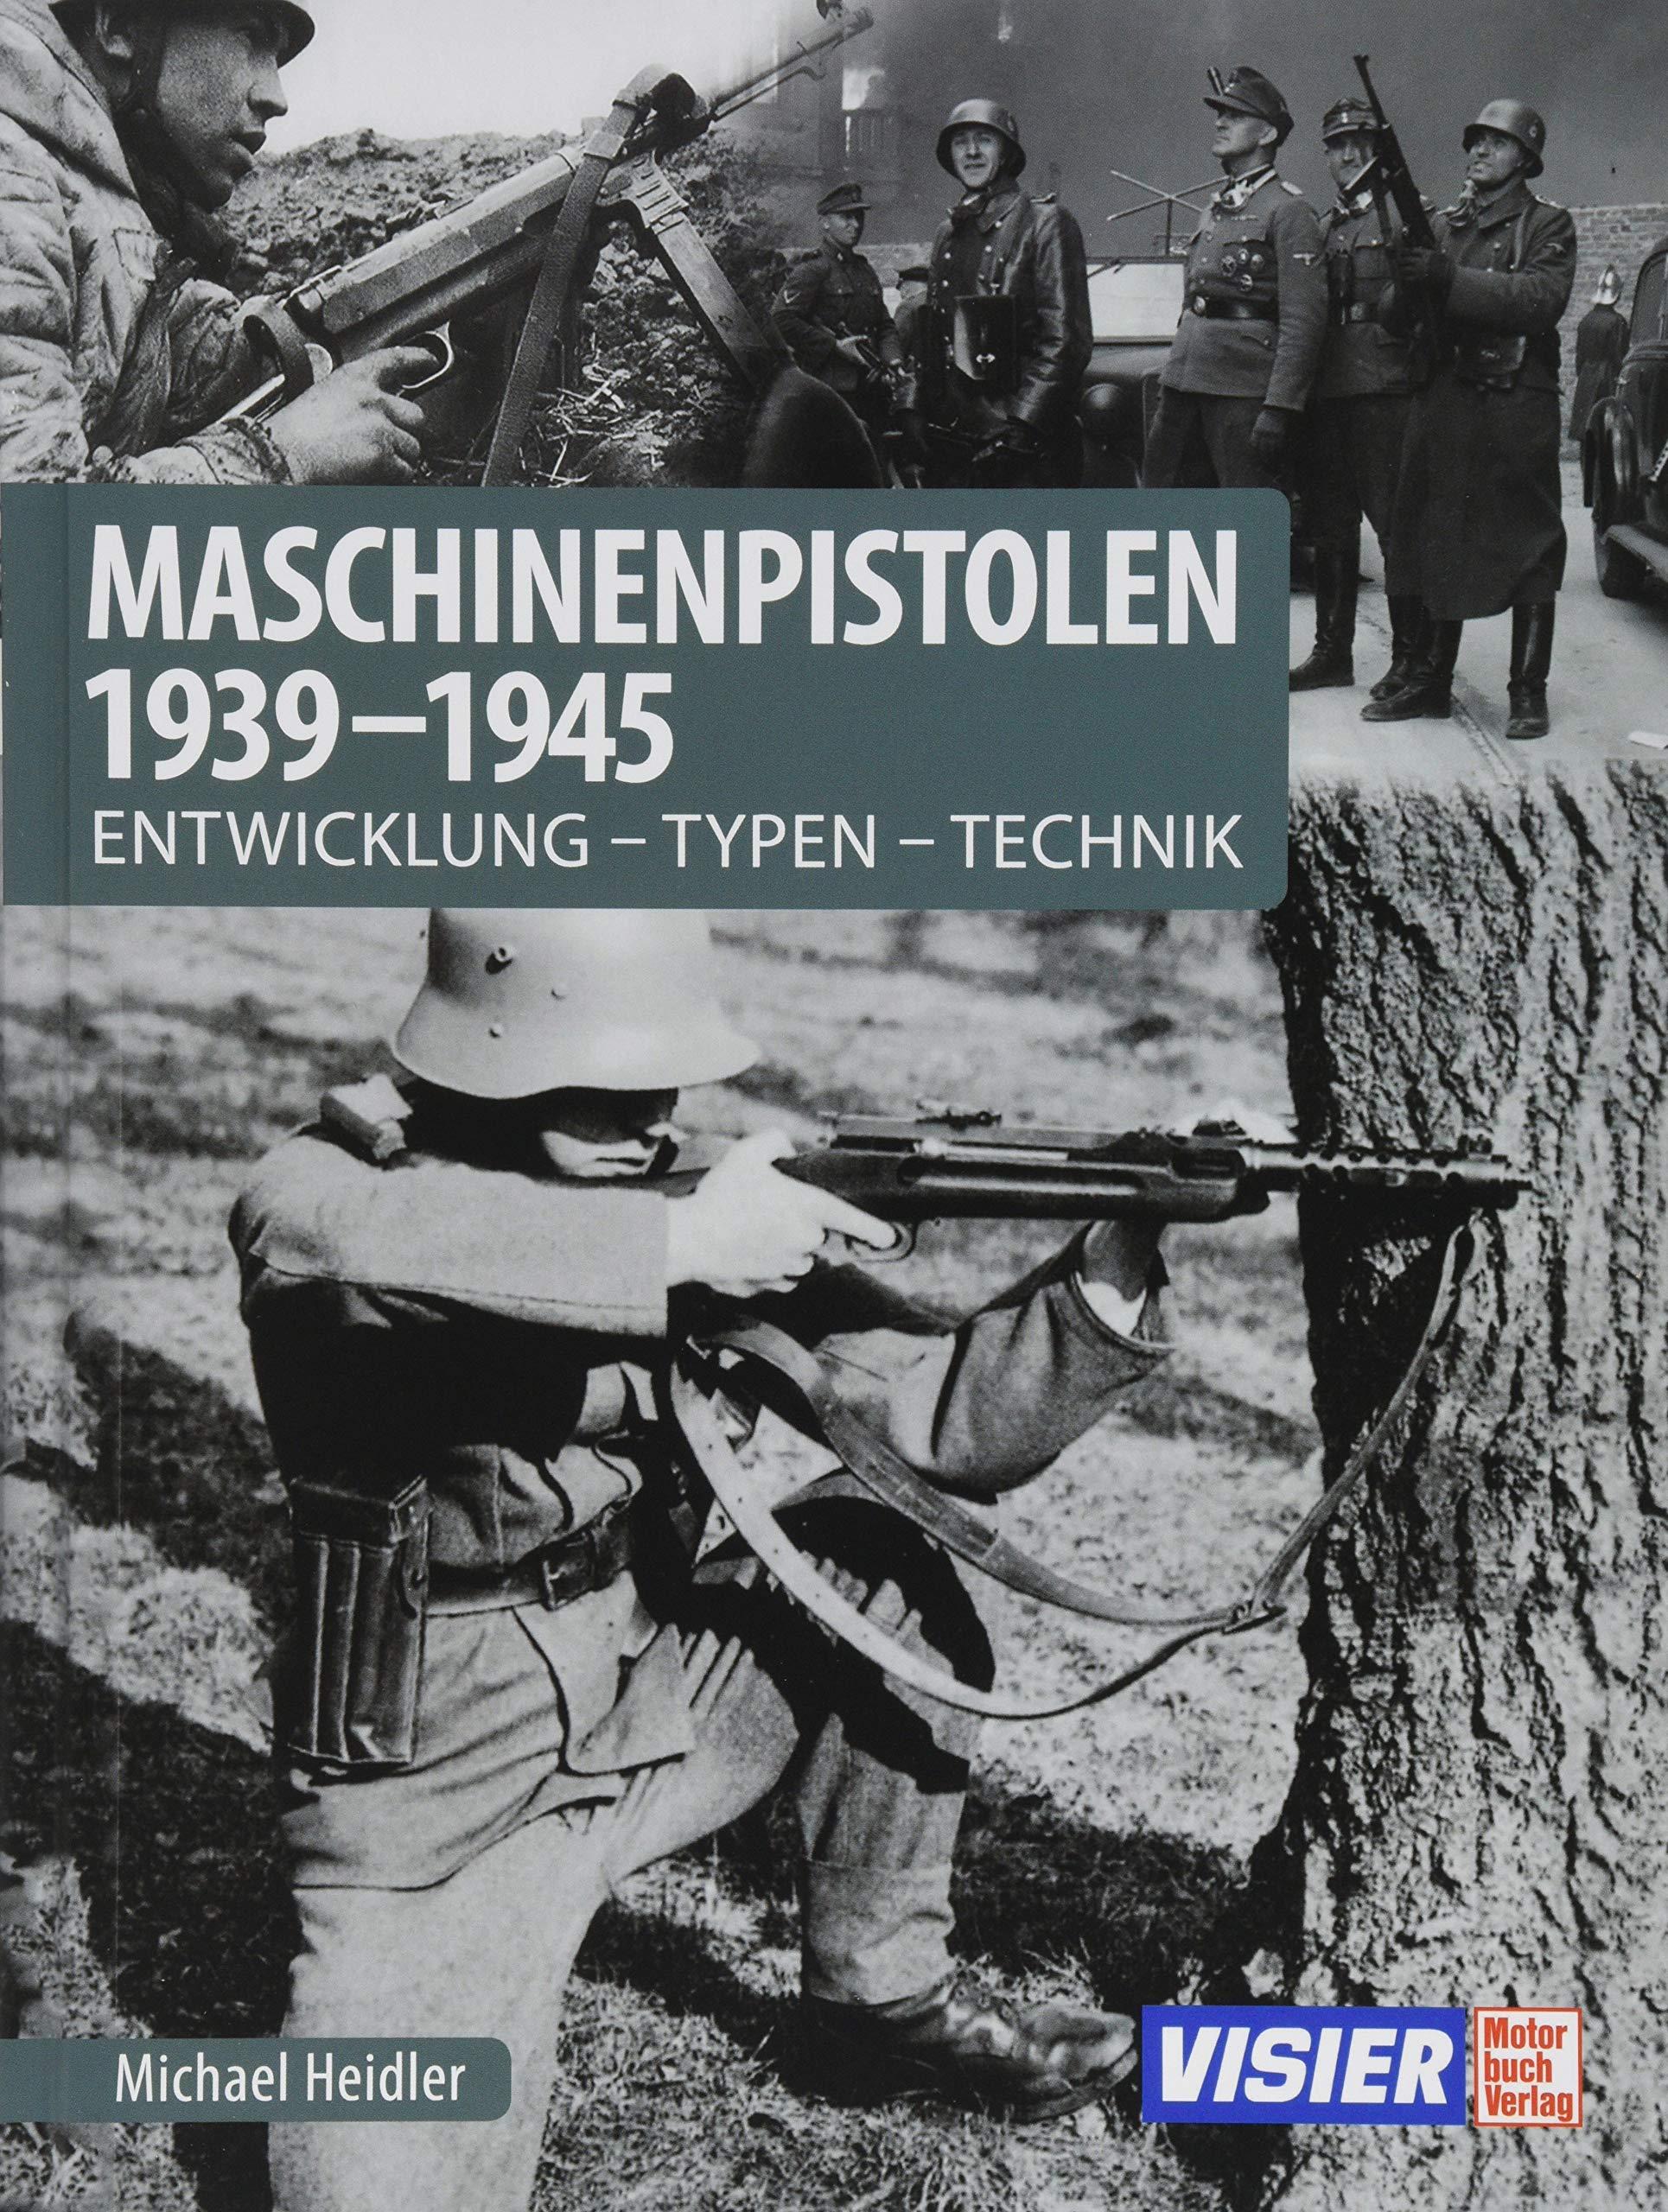 Maschinenpistolen 1939-1945 Typen Technik Entwicklung Michael Heidler